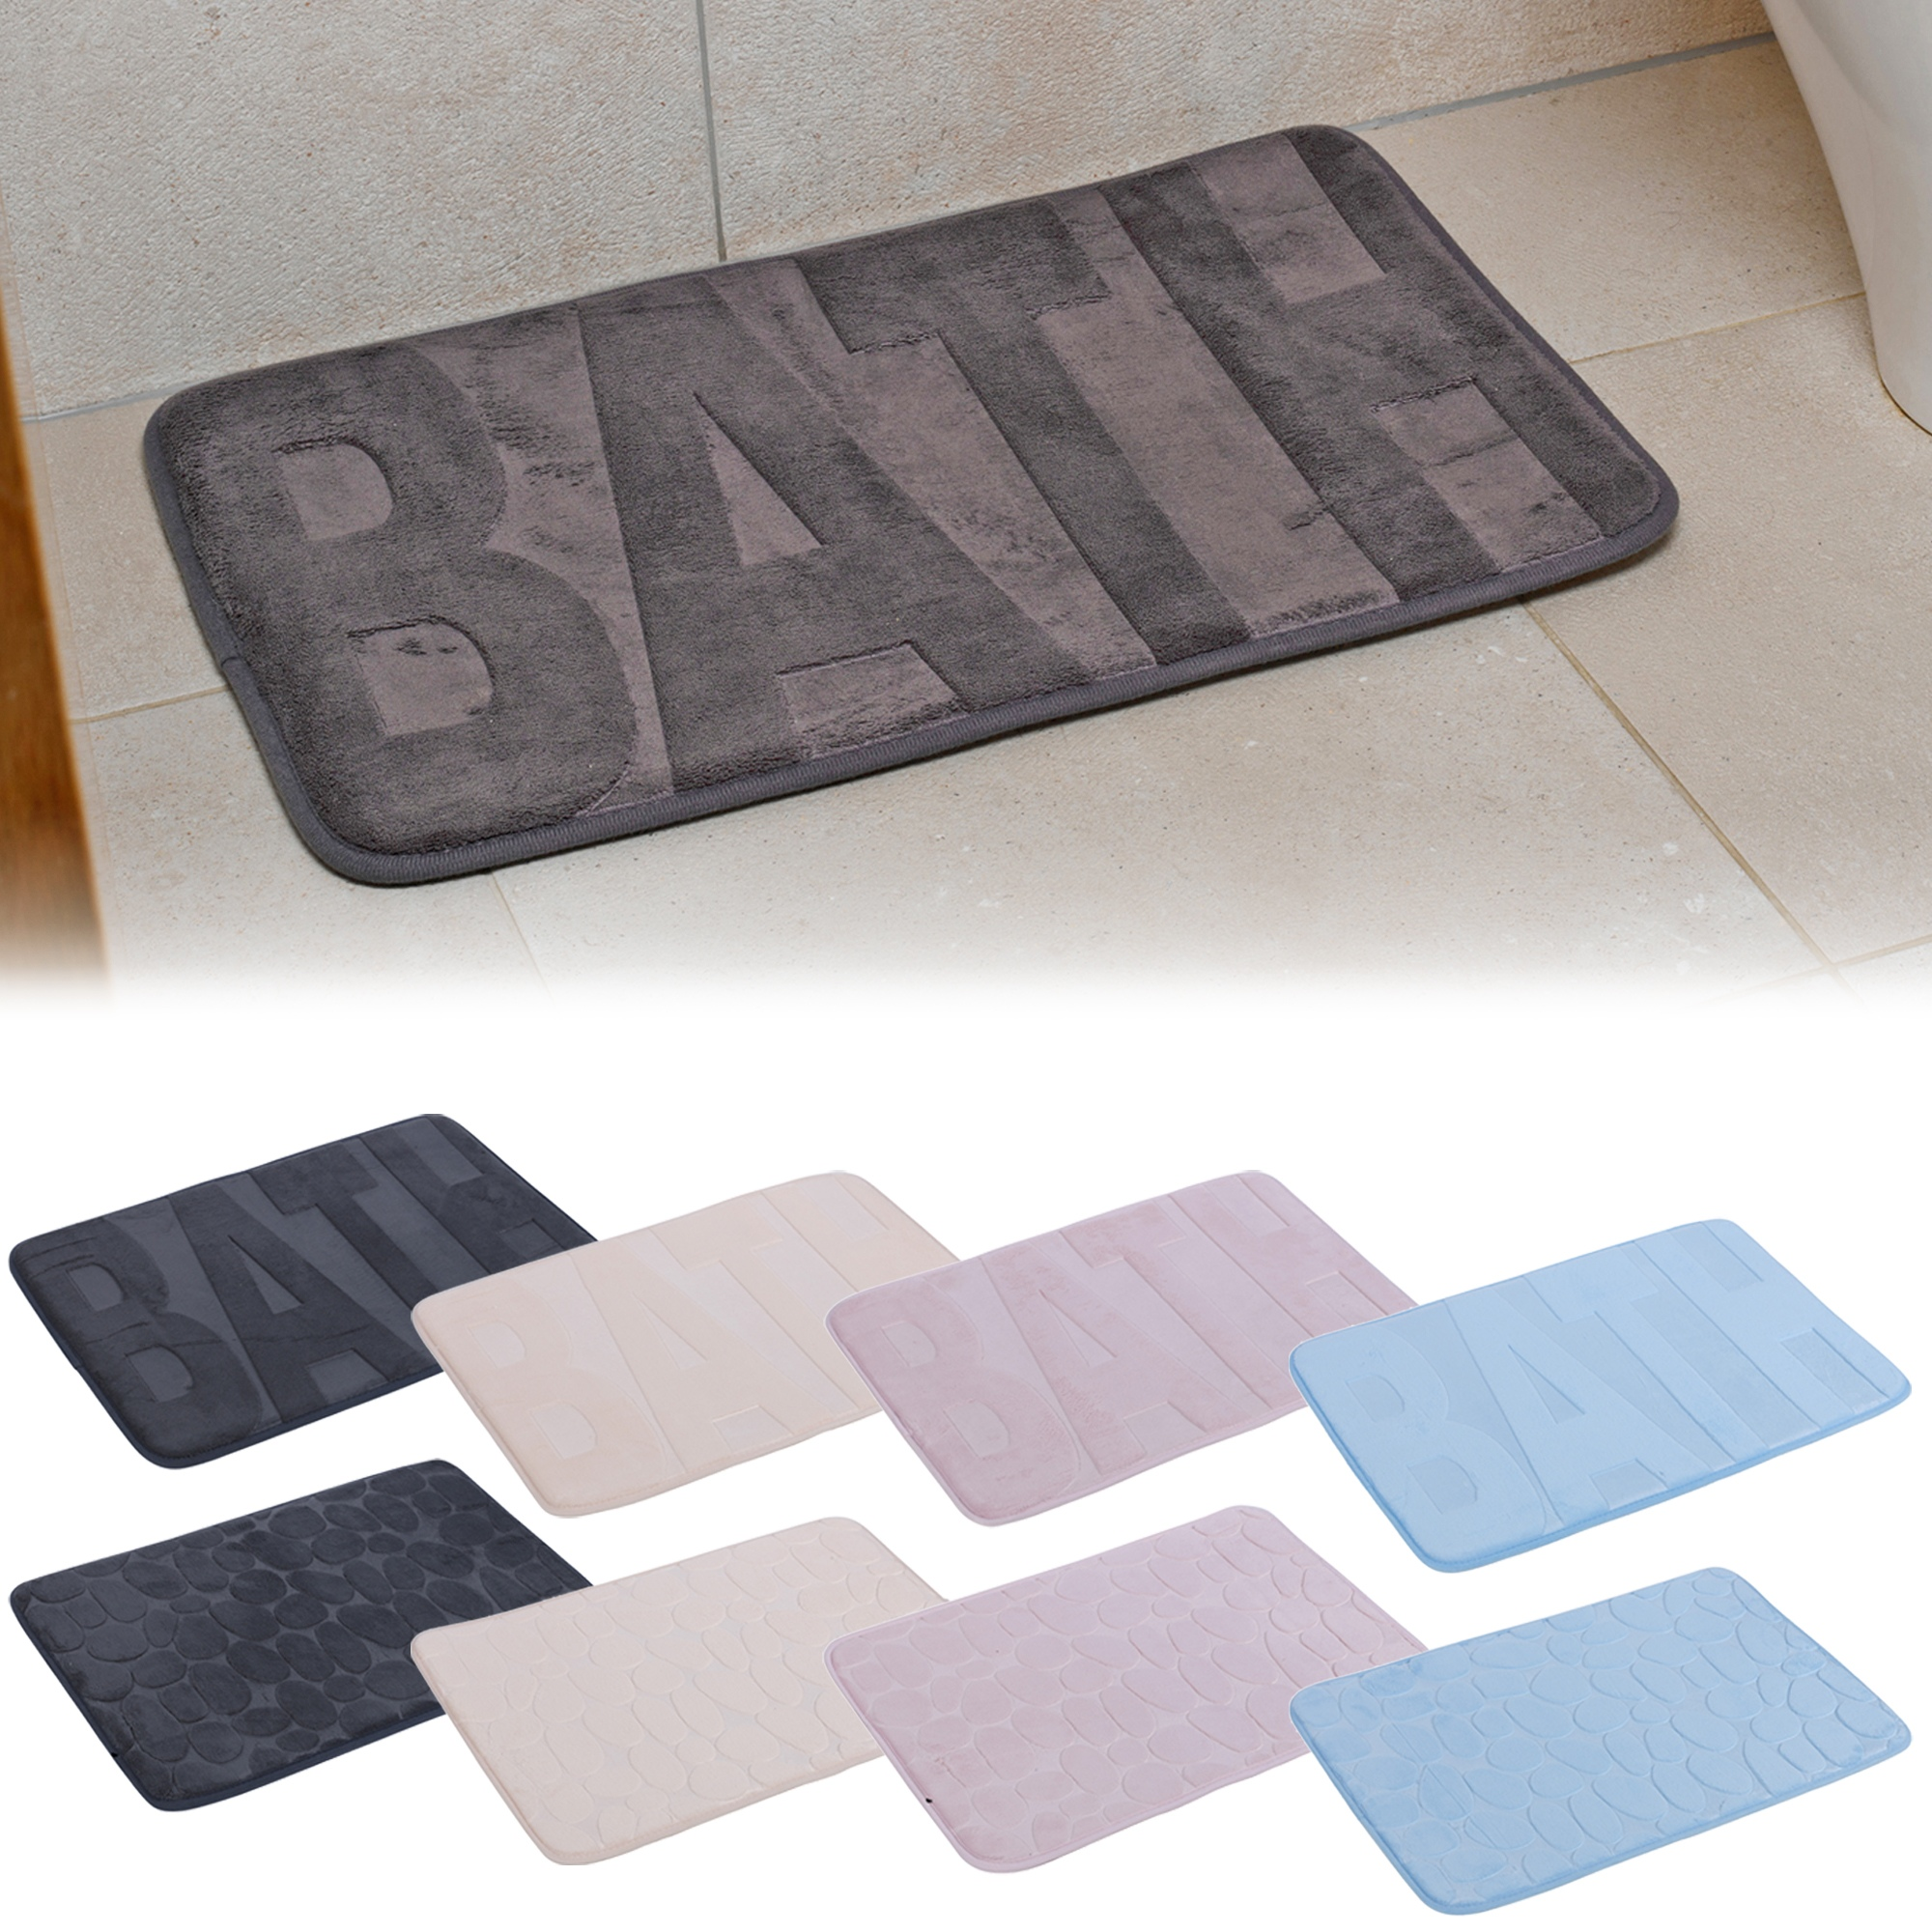 Bath Bath Rug Non Slip Absorbent Soft Bathroom Carpet Shower Floor Mat Uk Home Furniture Diy Hashtagcoffee Com Au